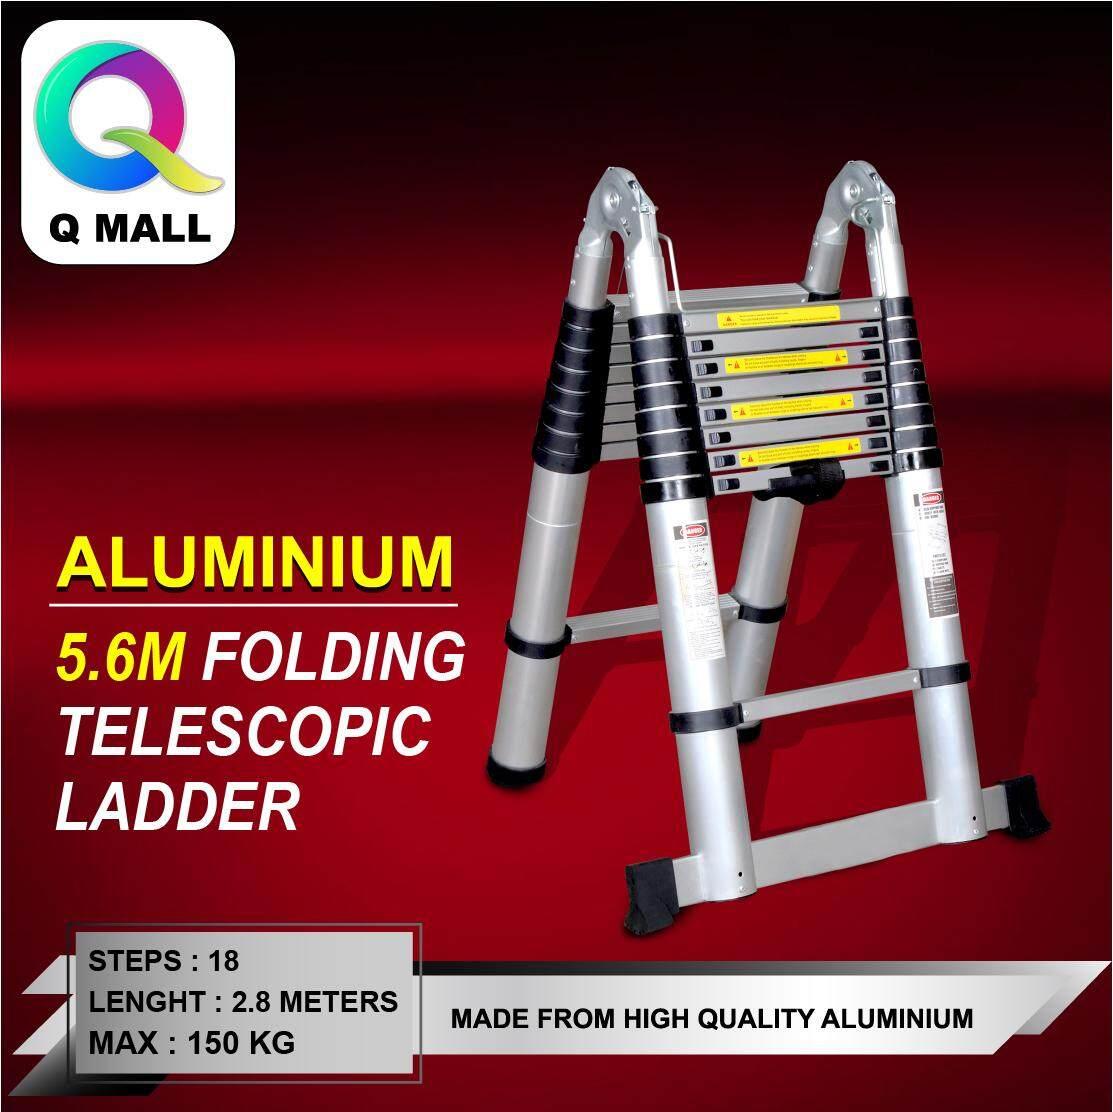 QMALL 2.8M x 2.8M Aluminium Telescopic Pole Ladder Multi-Purpose Extendable Folding Ladder  With 18 Steps